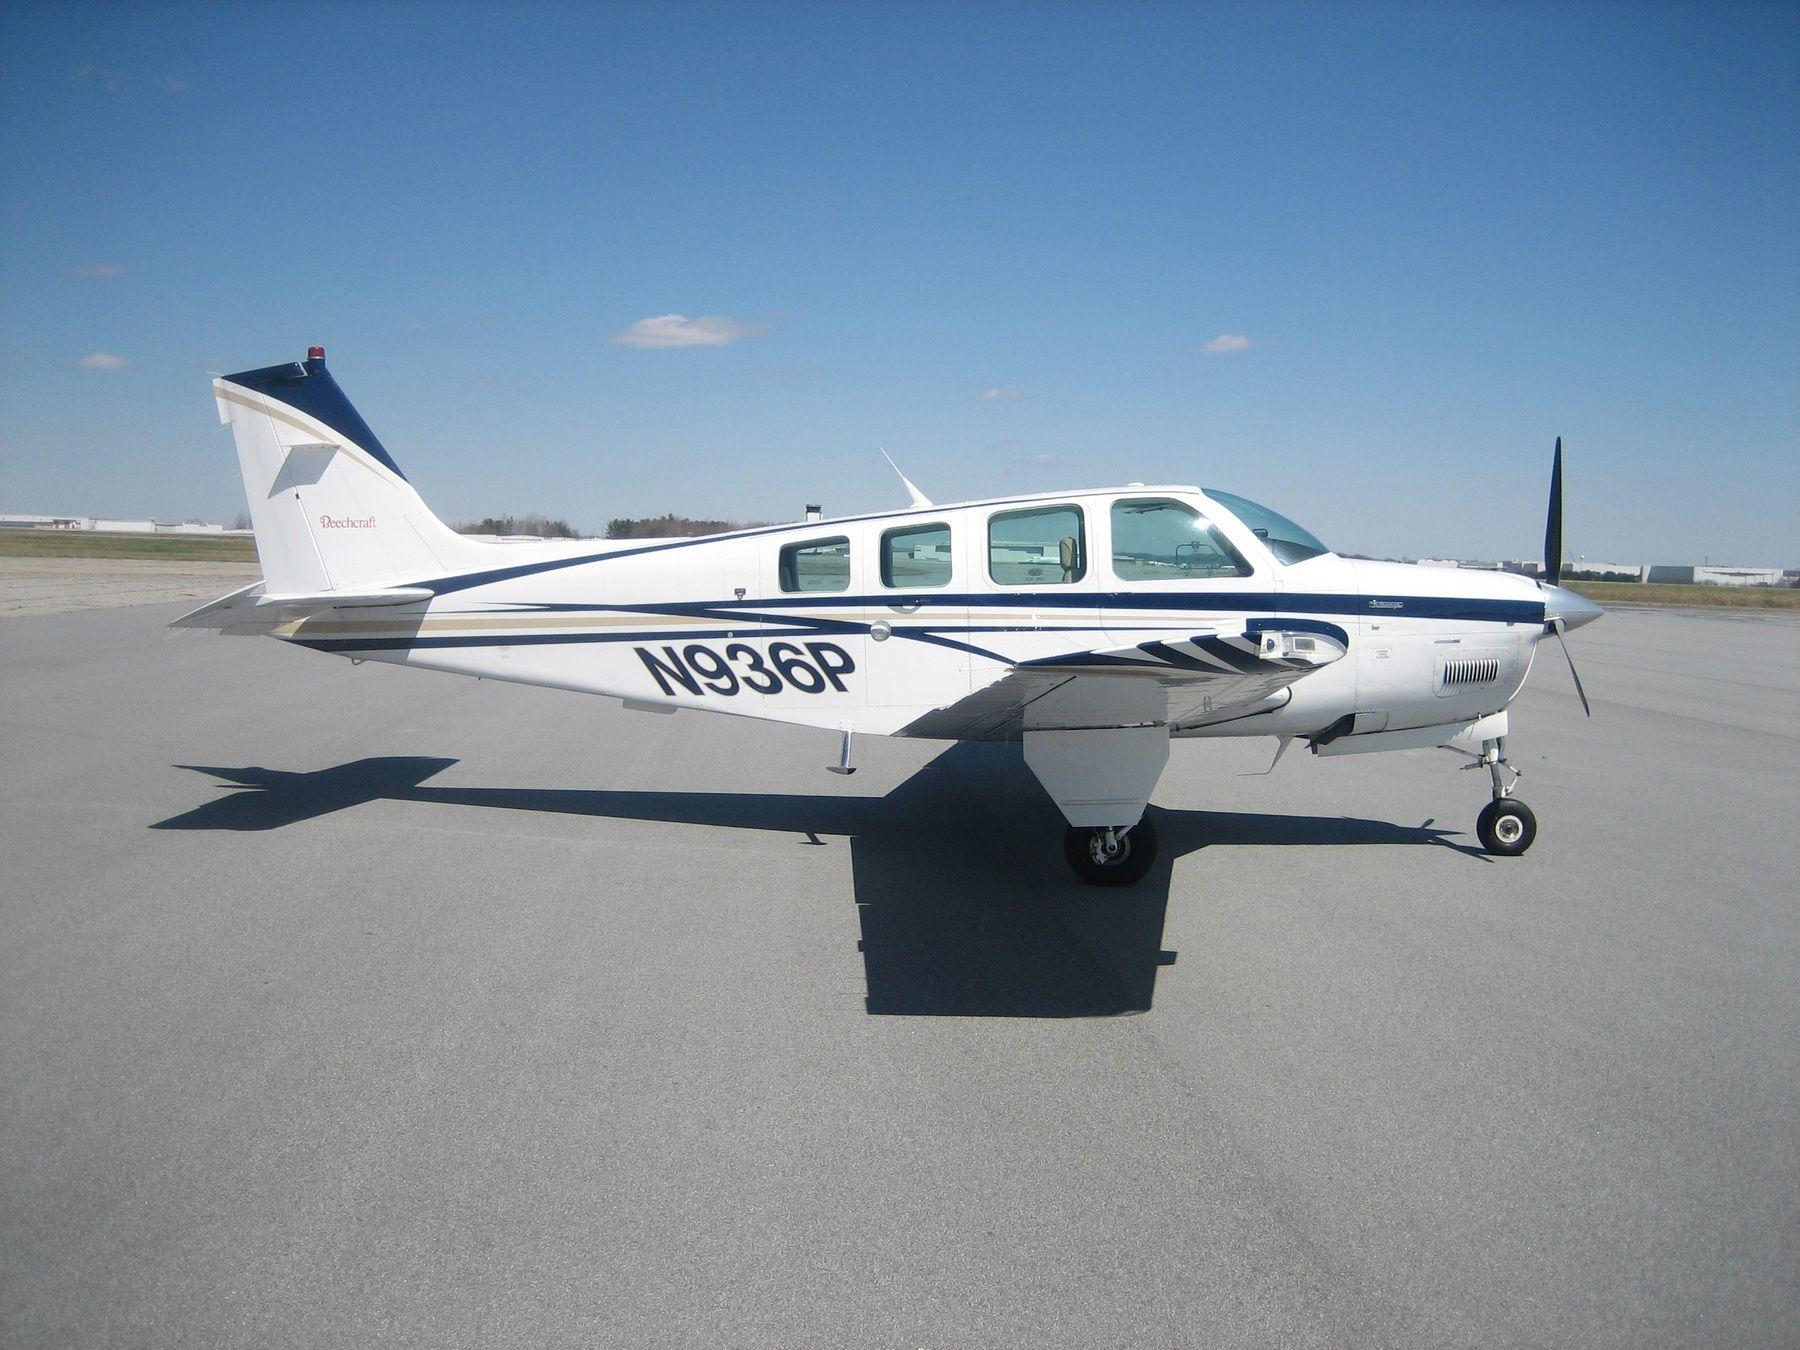 1985 Beechcraft Bonanza A36 for sale in NC United States => http://www.airplanemart.com/aircraft-for-sale/Single-Engine-Piston/1985-Beechcraft-Bonanza-A36/10440/